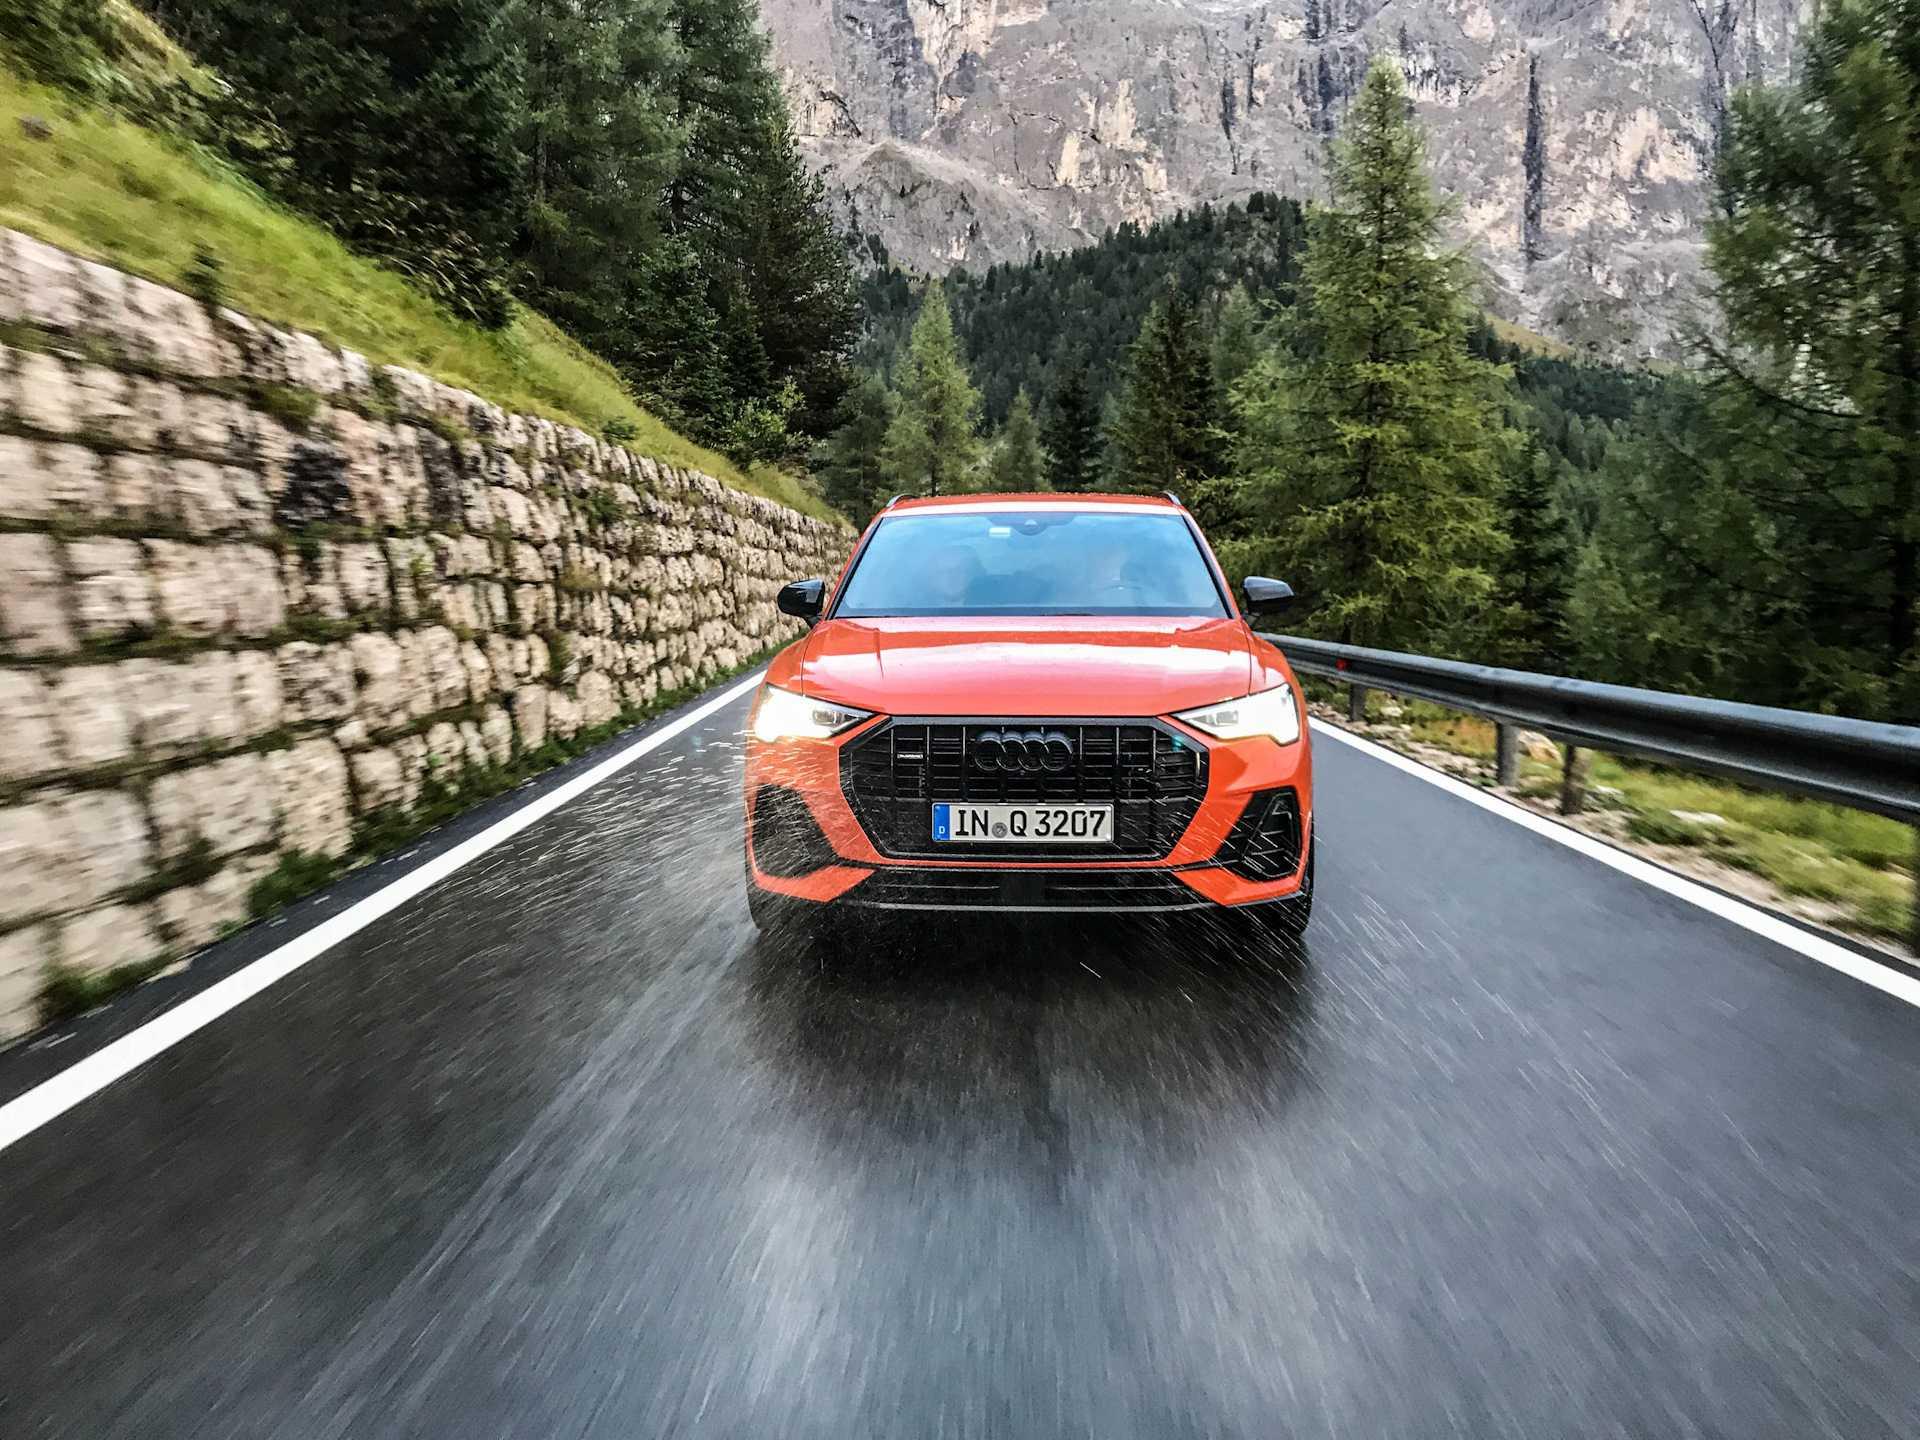 Audi a6 2018, седан, 5 поколение, c8 (03.2018 - н.в.) - технические характеристики и комплектации